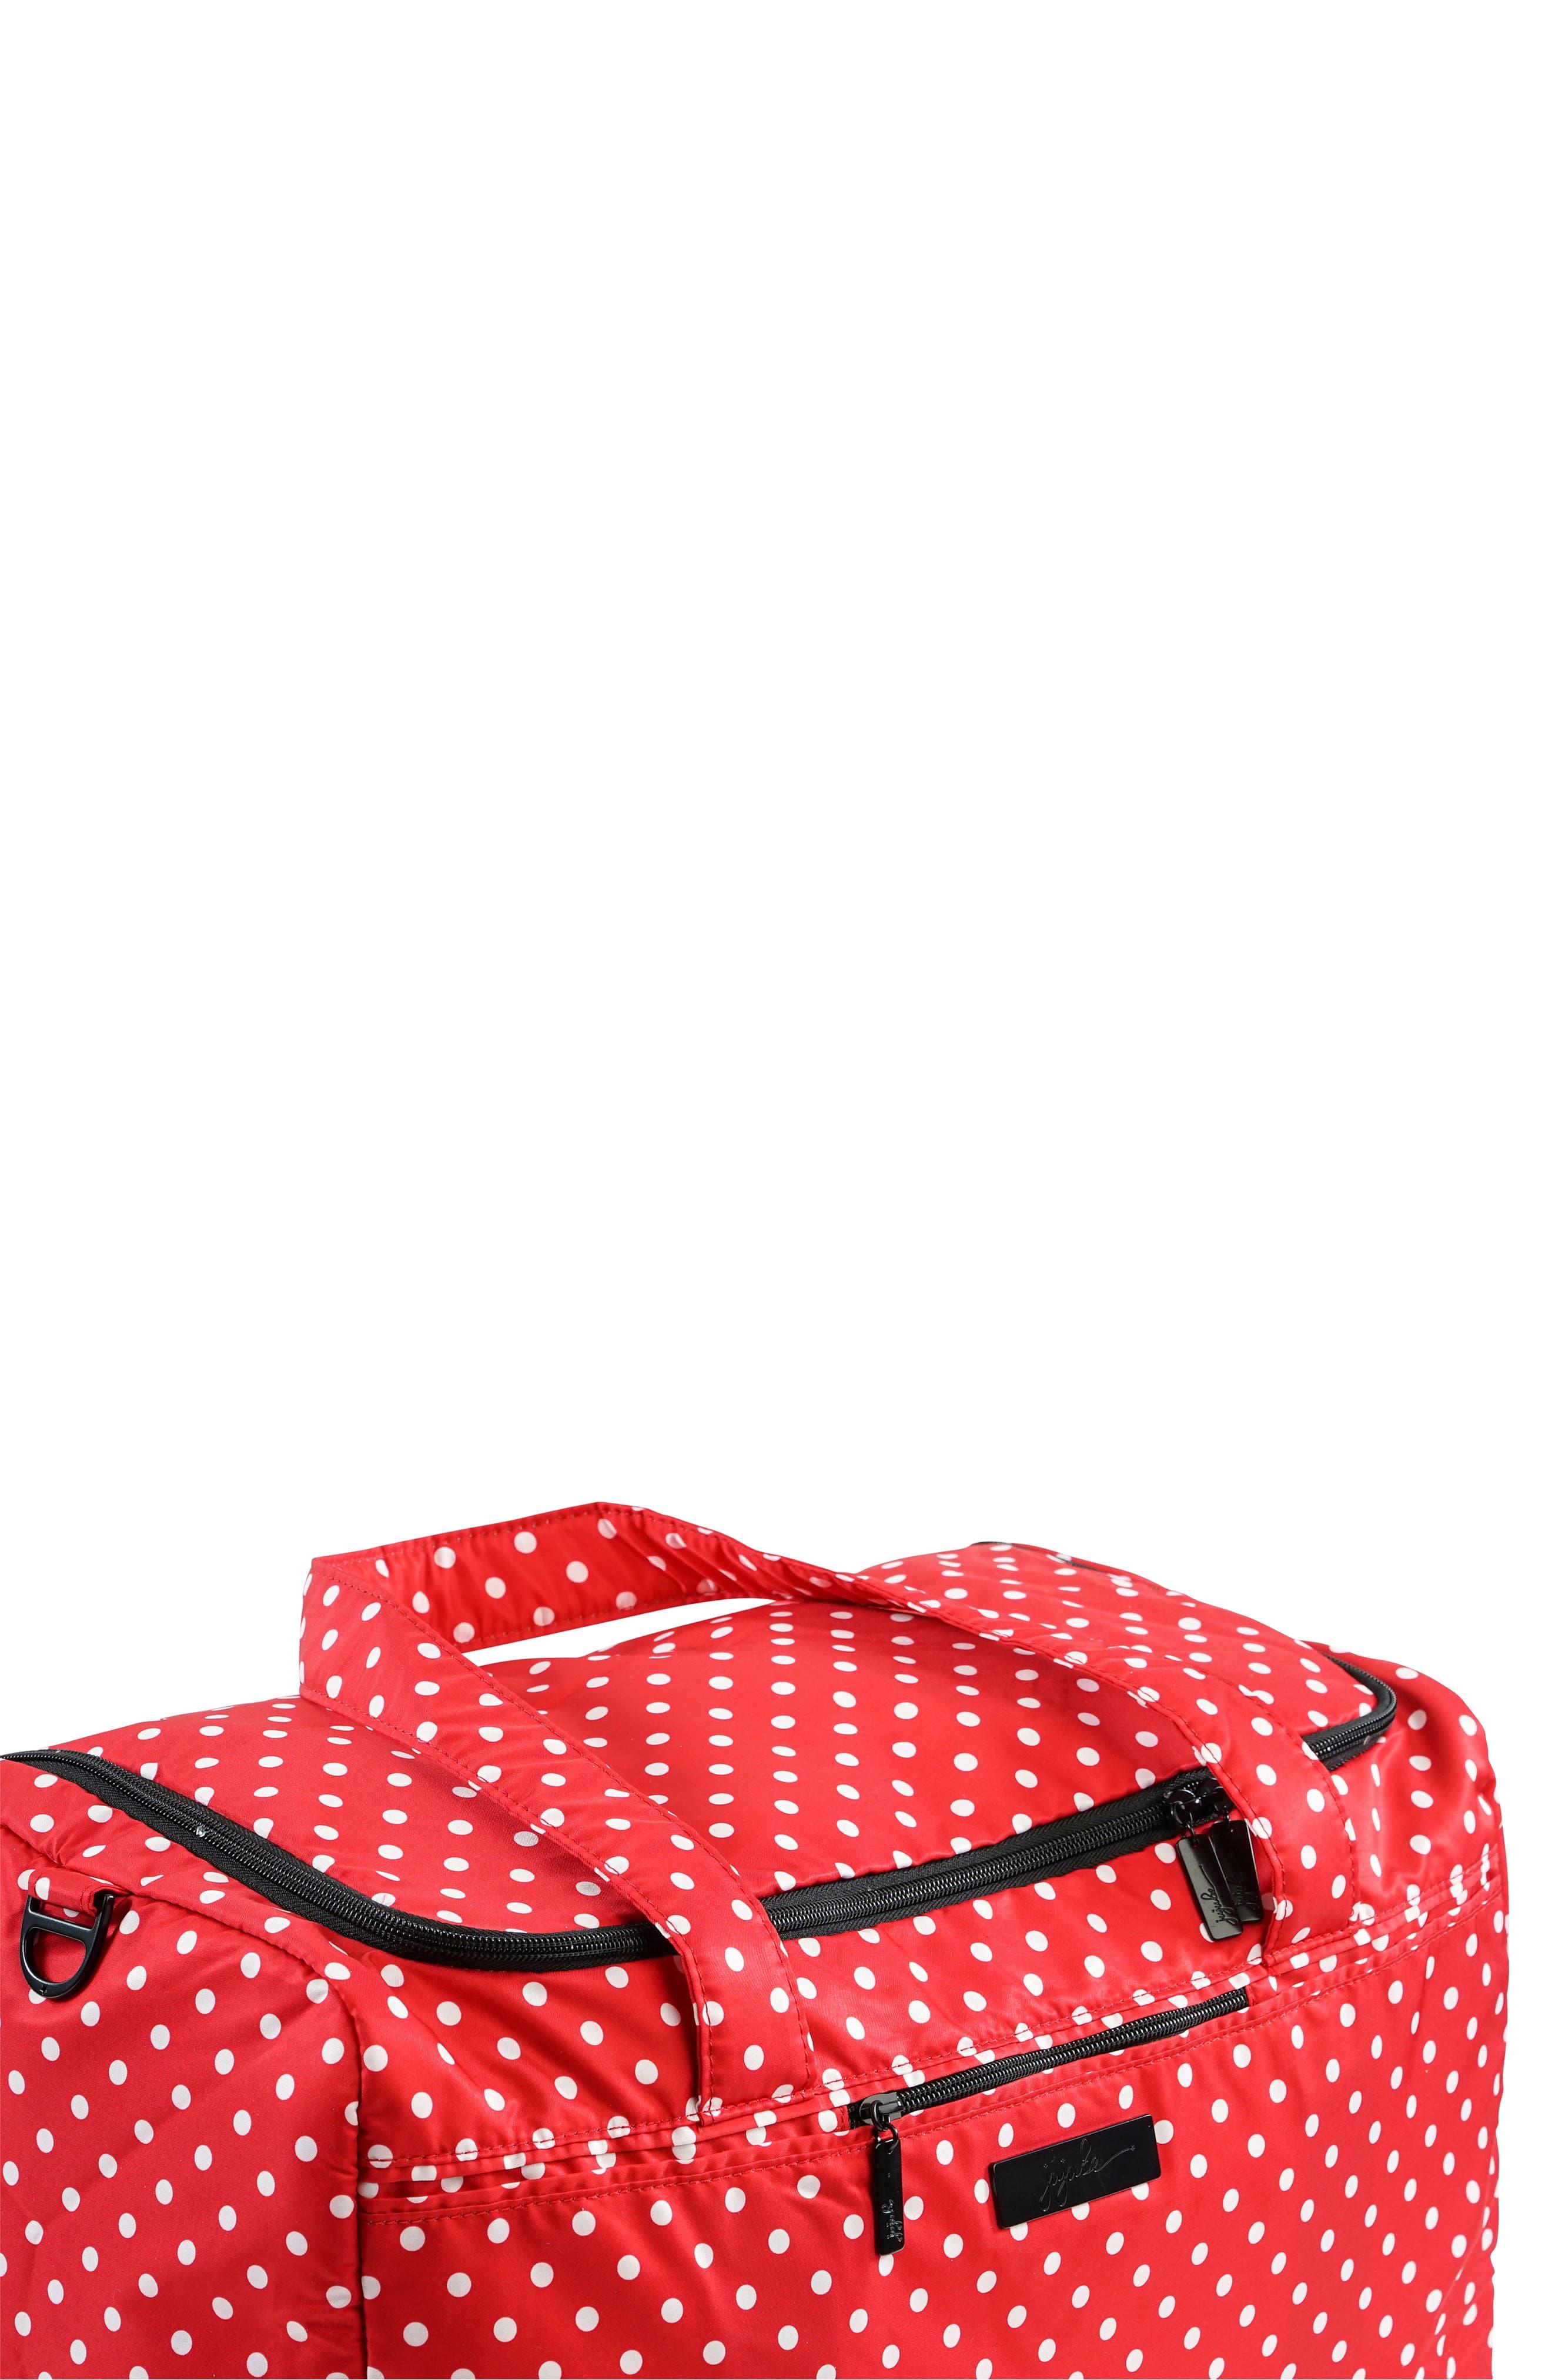 Onyx Super Star Diaper Bag,                             Alternate thumbnail 2, color,                             BLACK RUBY